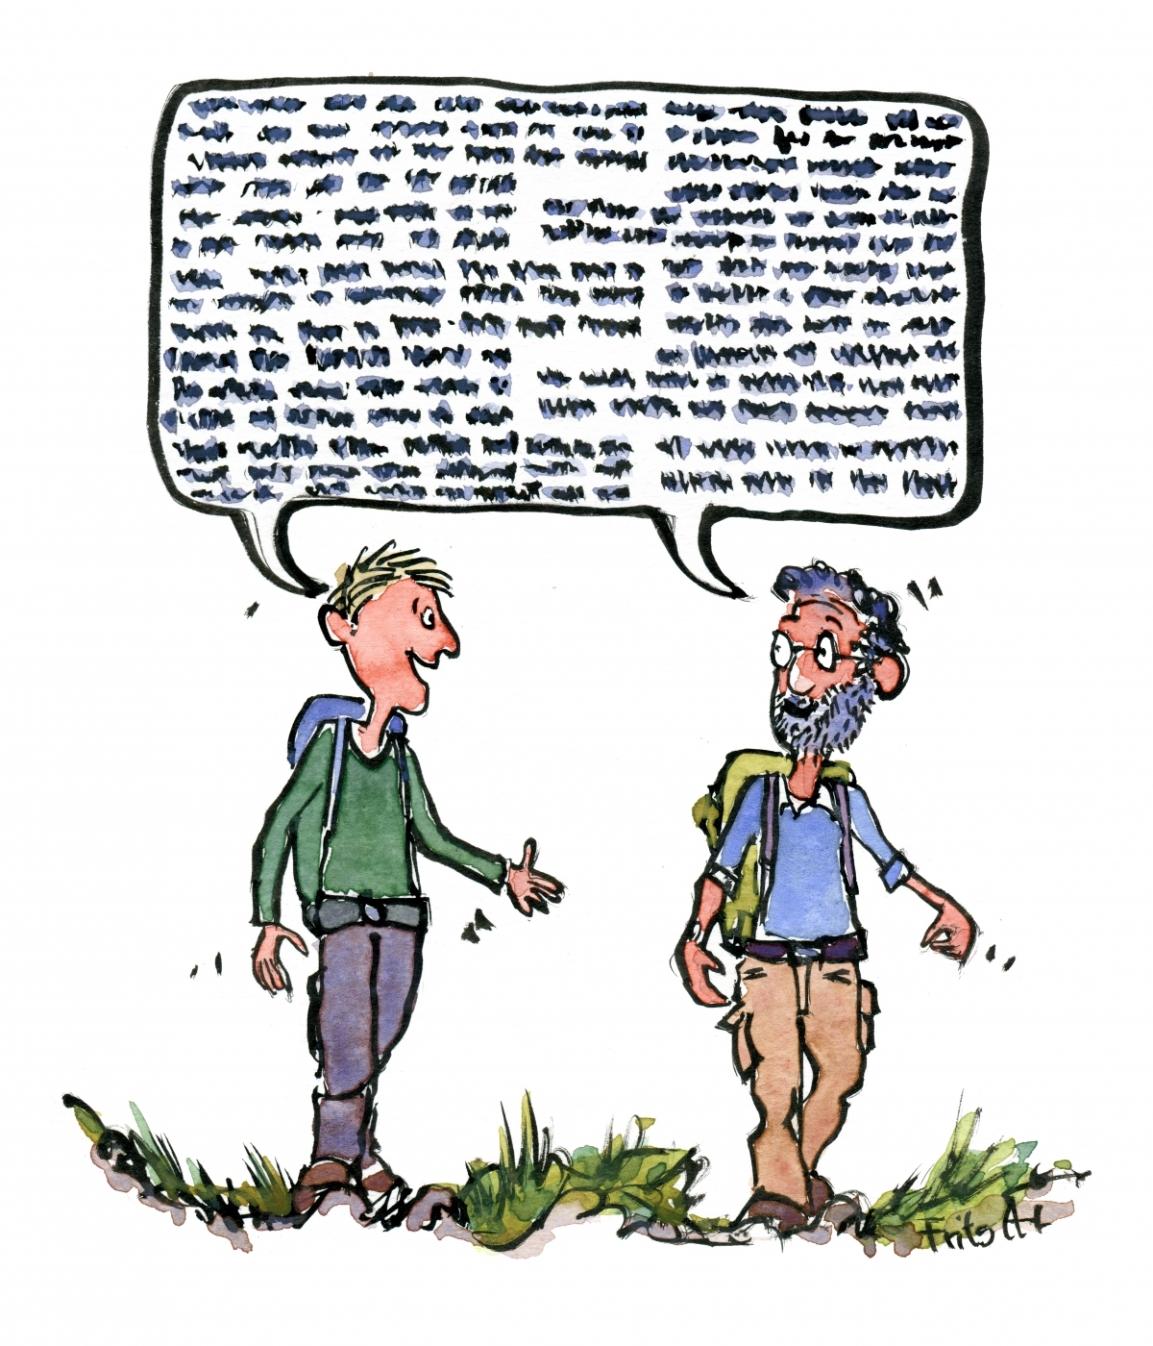 Walk the talkhikers